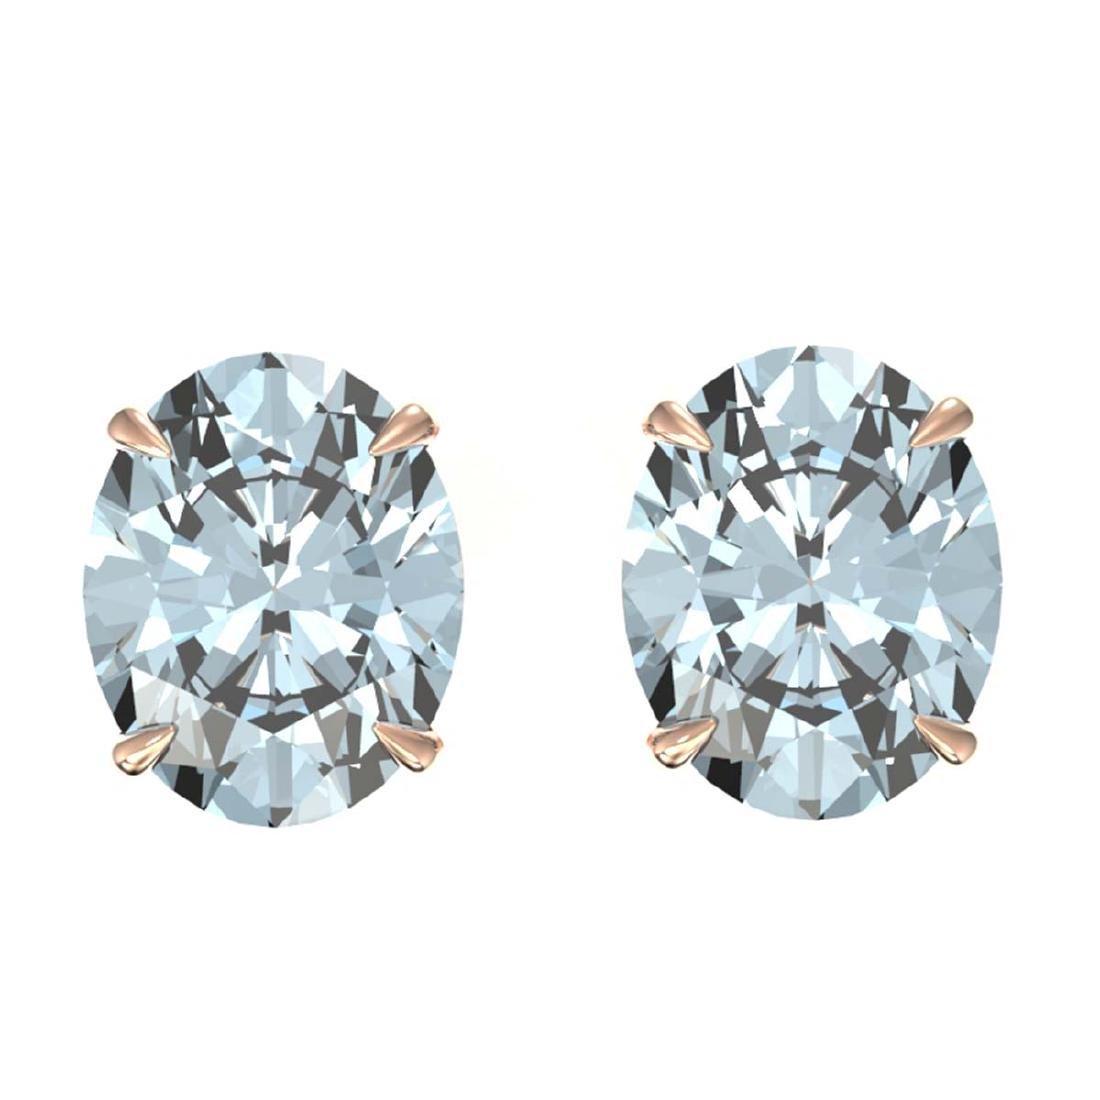 7 CTW Genuine Sky Blue Topaz Stud Earrings 14K Rose